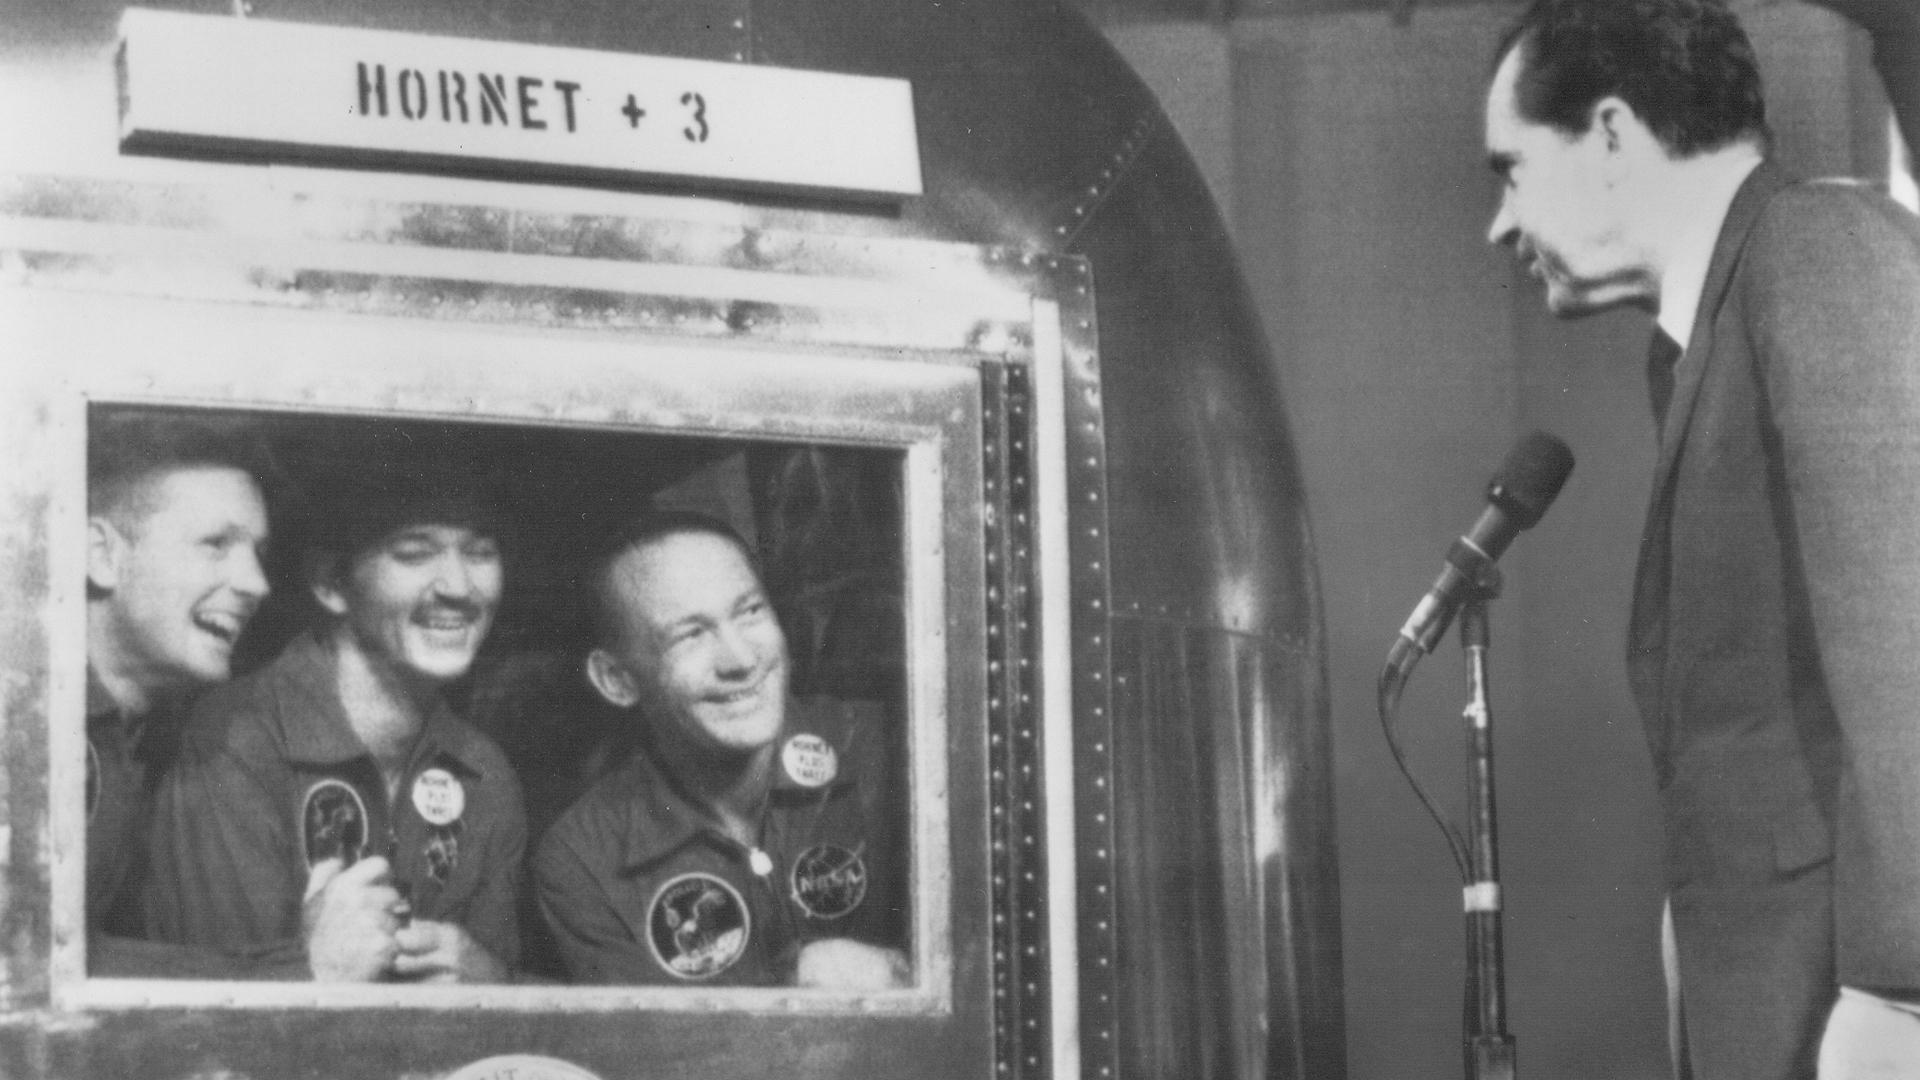 22-Heritage-History-Gallery-60s-1969-NixonAndAstronauts